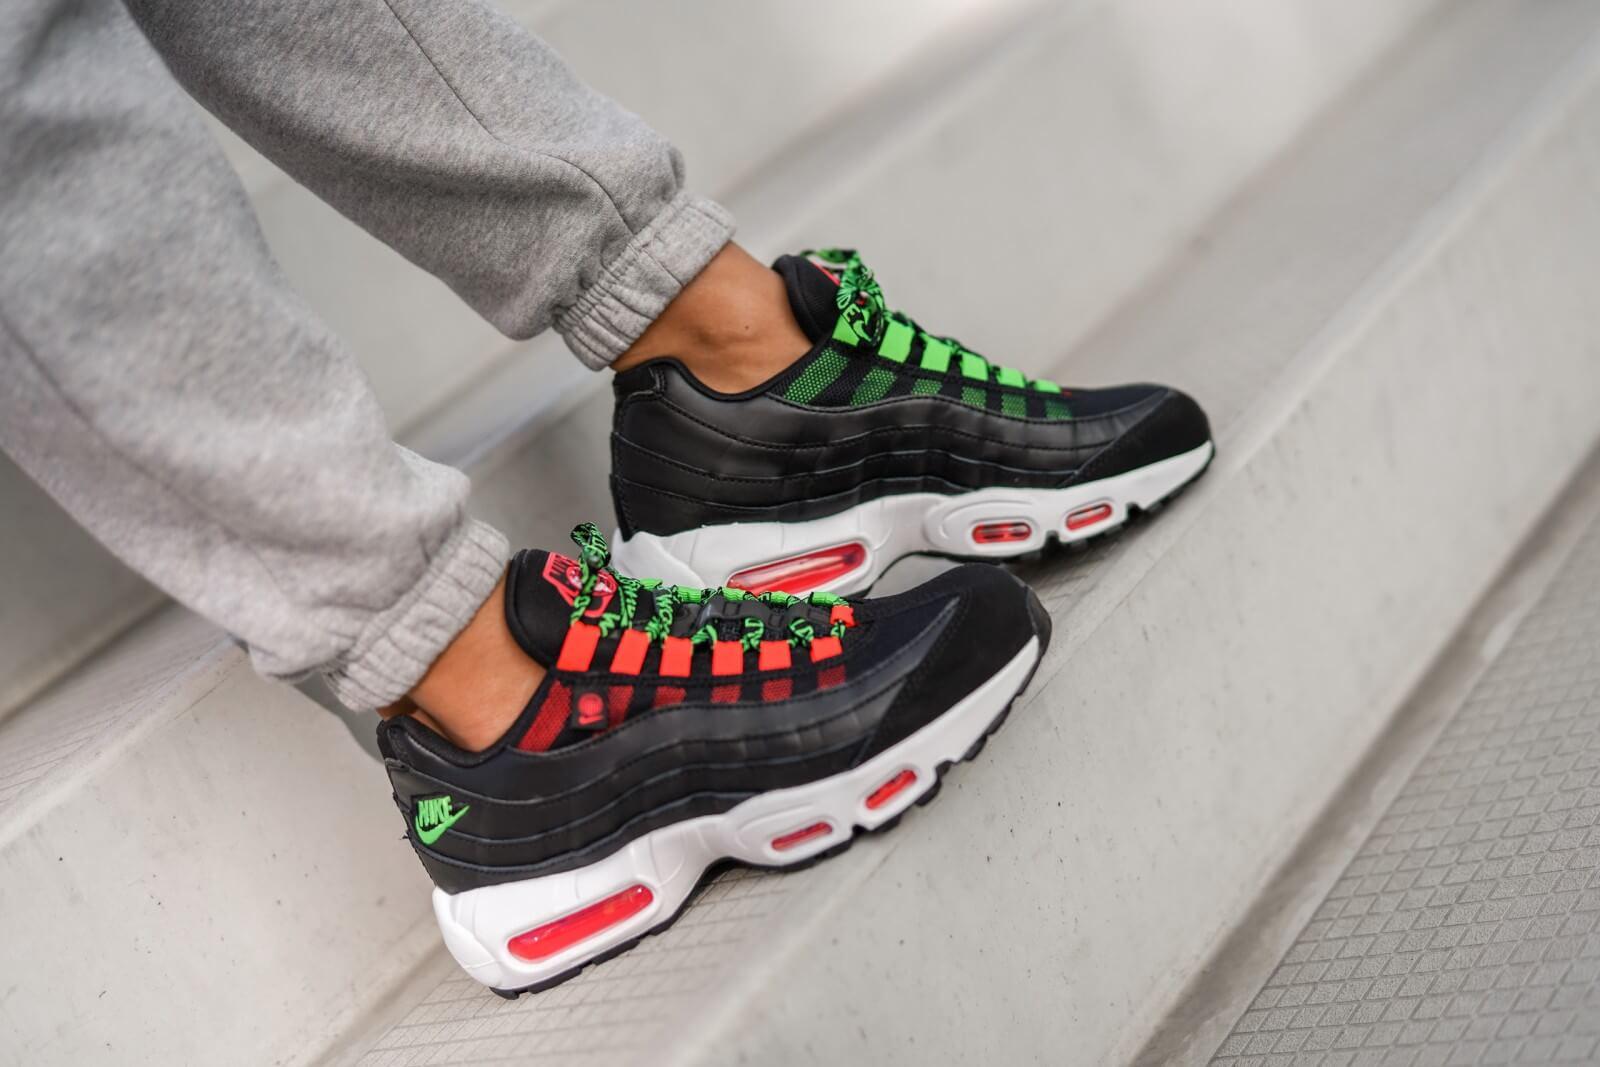 Nike Women's Air Max 95 SE Worldwide Pack Black/Flash Crimson-White-Green Strike